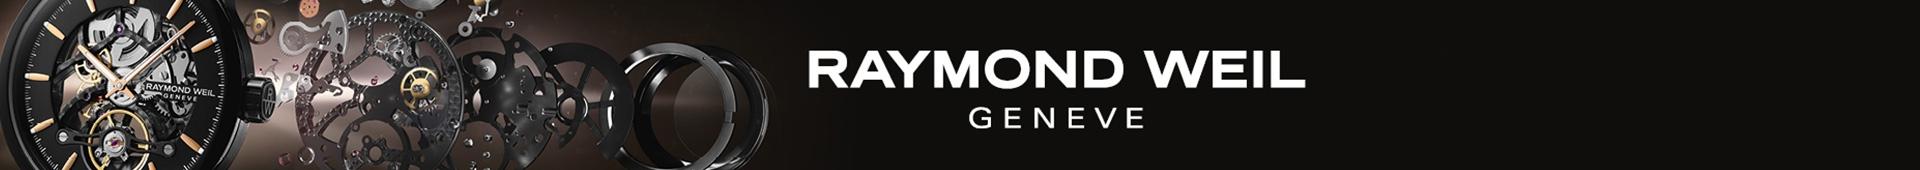 Raymond Weil Limited Editions